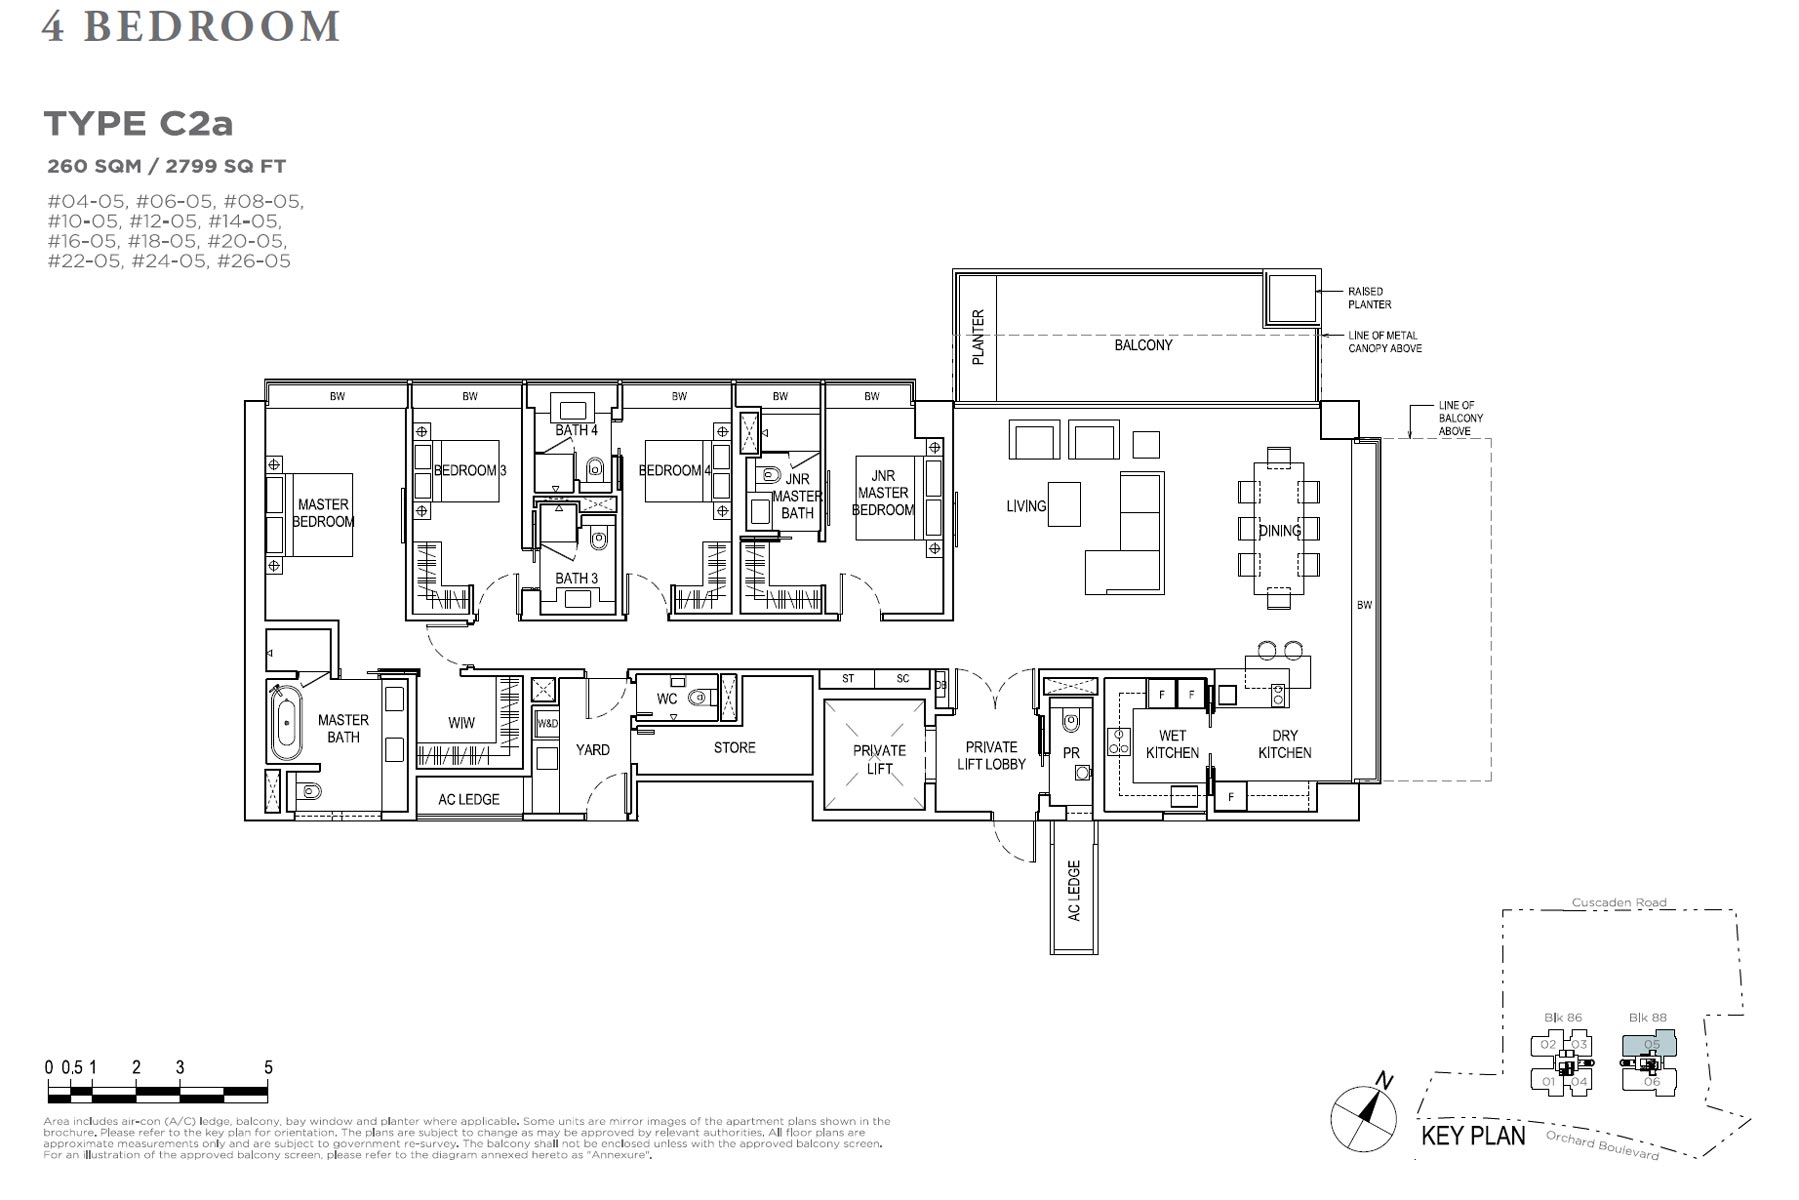 Boulevard 88 - 4 Bedroom C2a